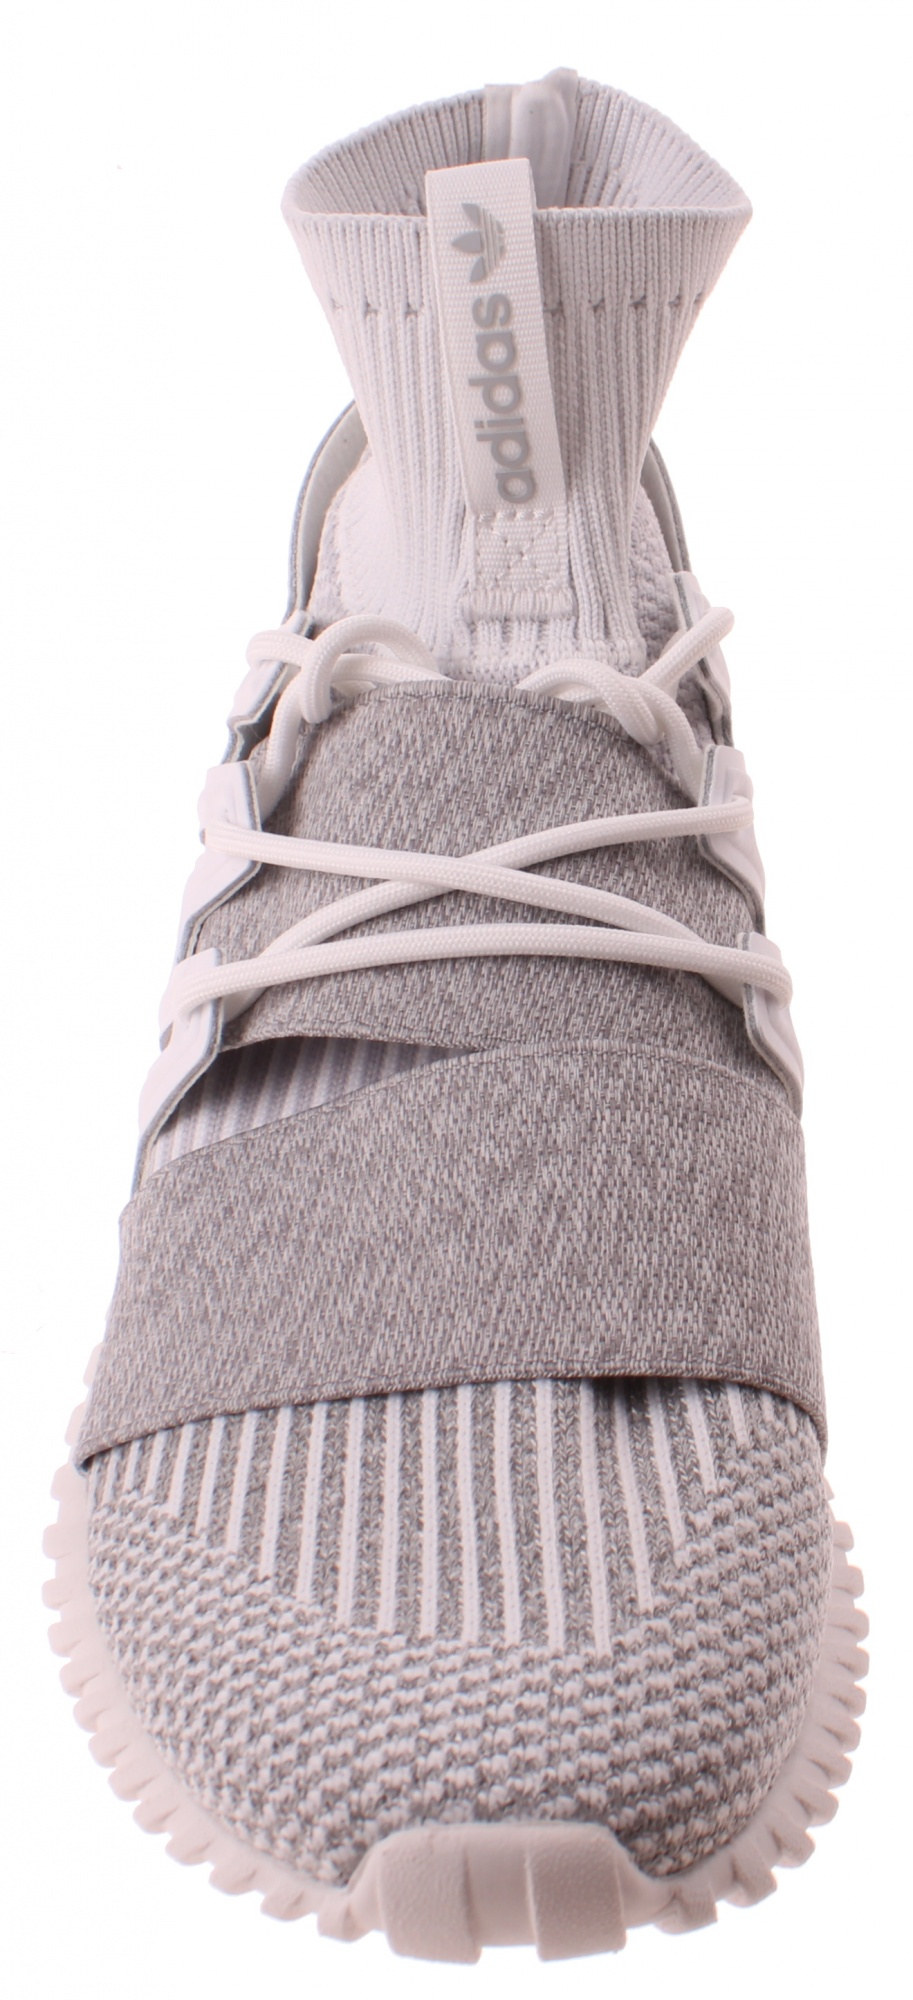 adidas Sneakers Tubular Doom PK Männer weiß grau 40 mt